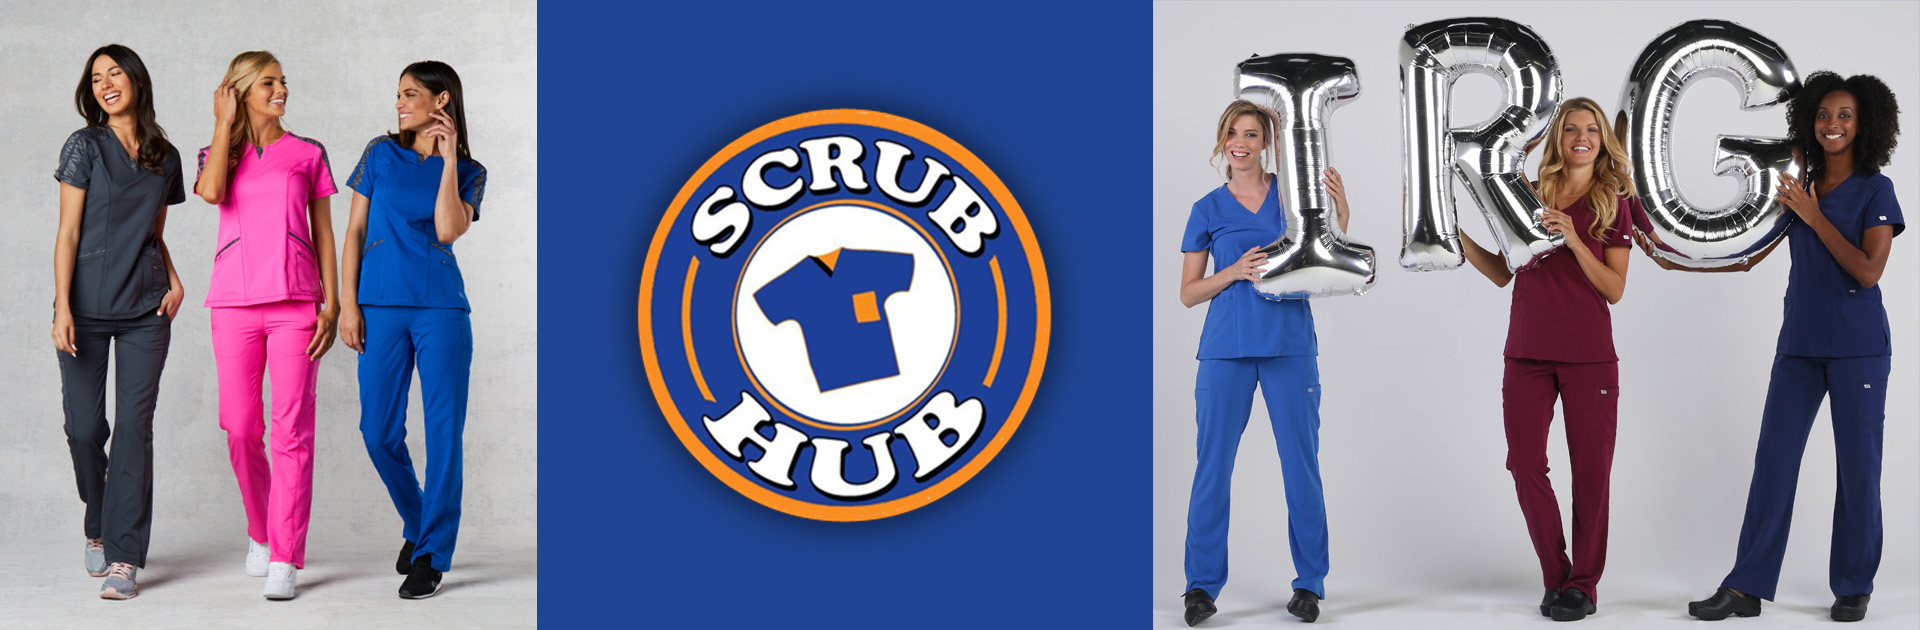 Scrub Hub Club Membership For Loyal Customers Kansas City Liberty